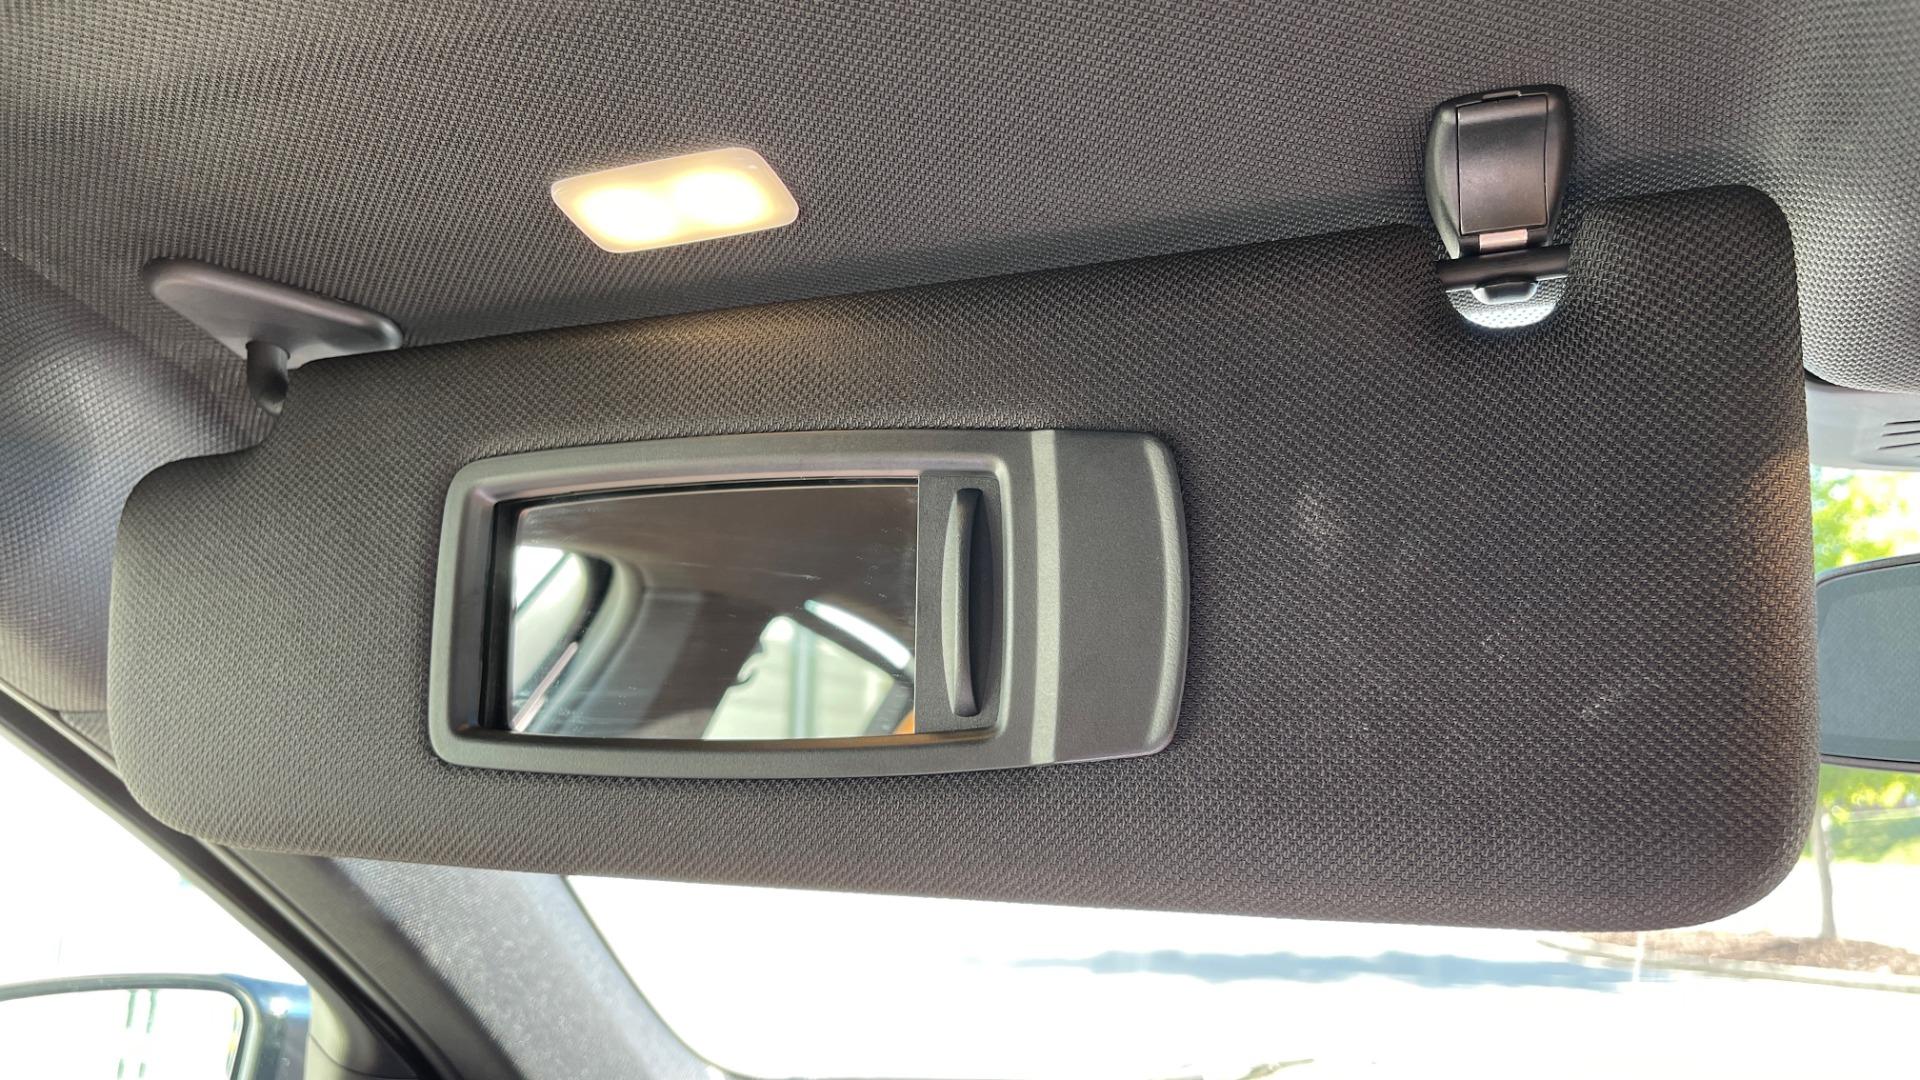 Used 2019 BMW 7 SERIES 750I XDRIVE M-SPORT / EXEC PKG / DRVR ASST PLUS / CLD WTHR / PAR for sale $60,995 at Formula Imports in Charlotte NC 28227 41